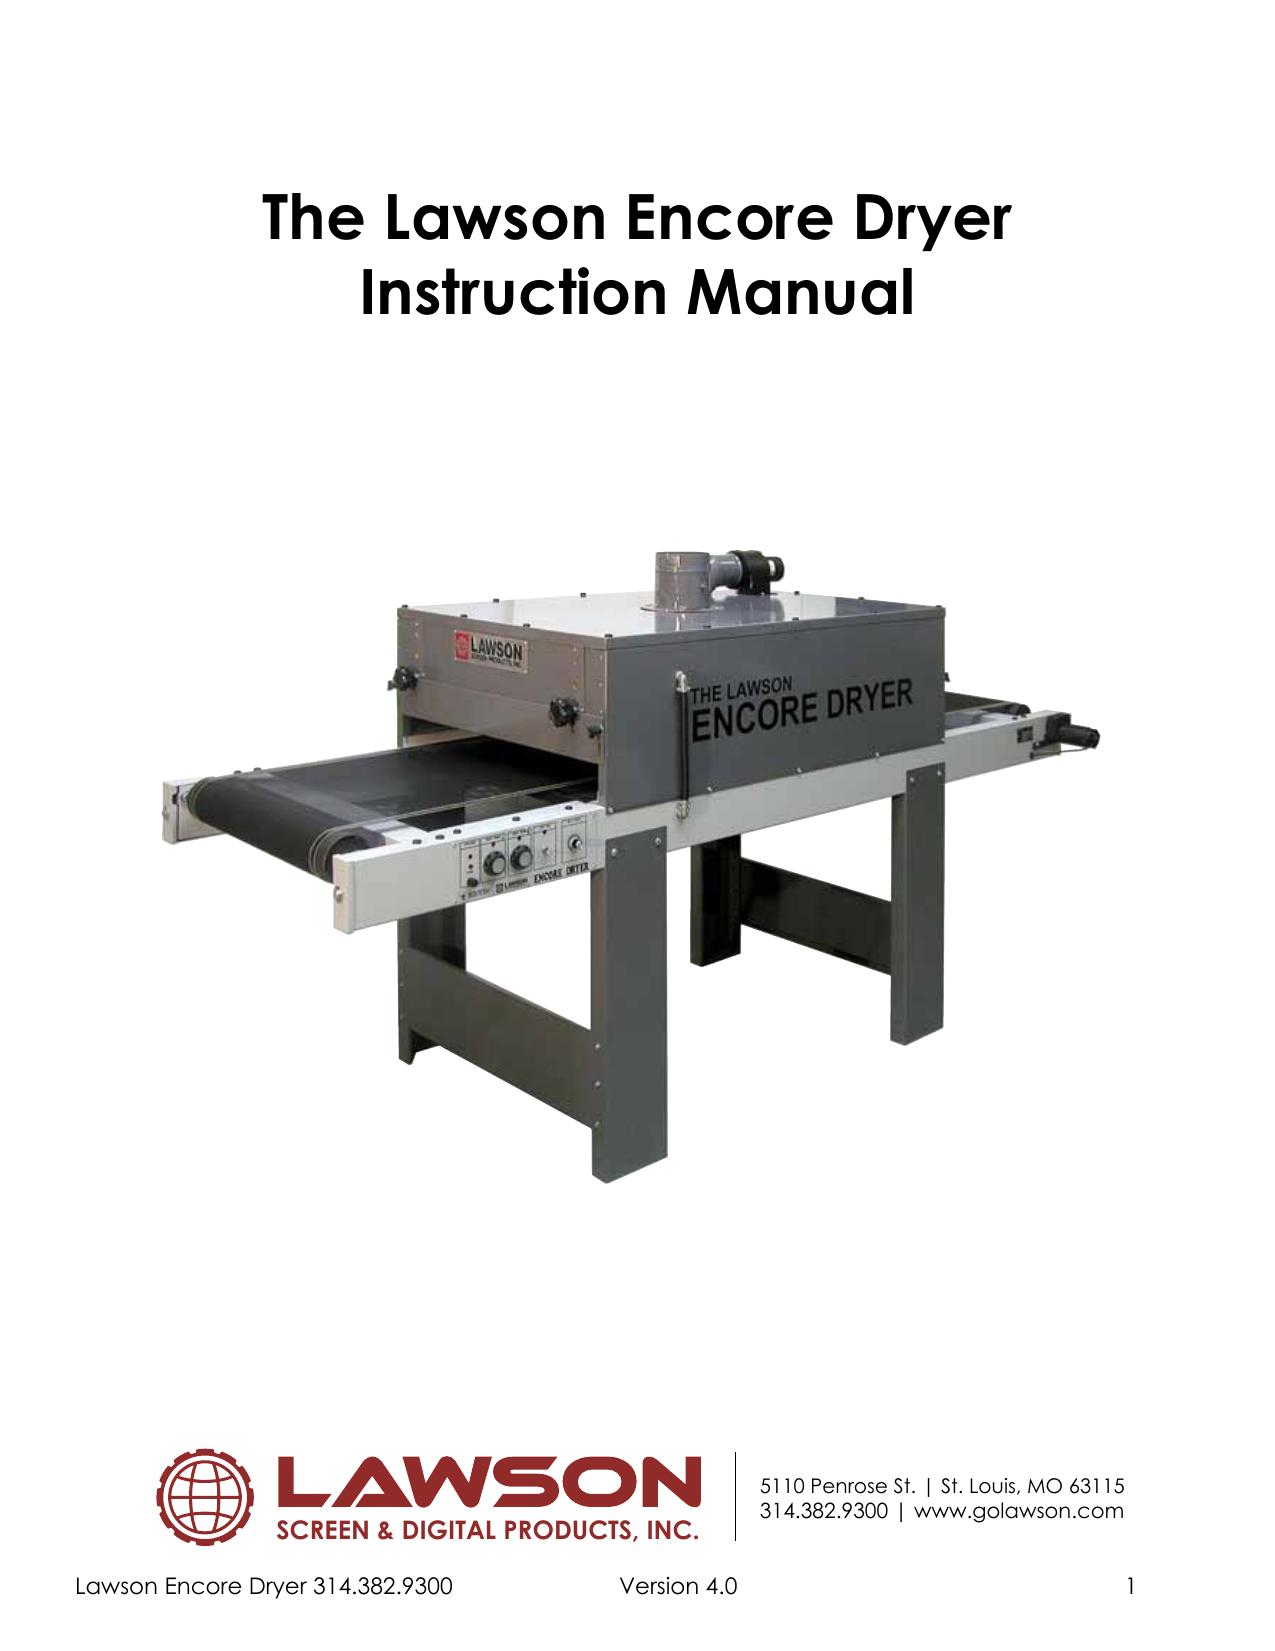 The Lawson Encore Dryer Instruction Manual Manualzzcom